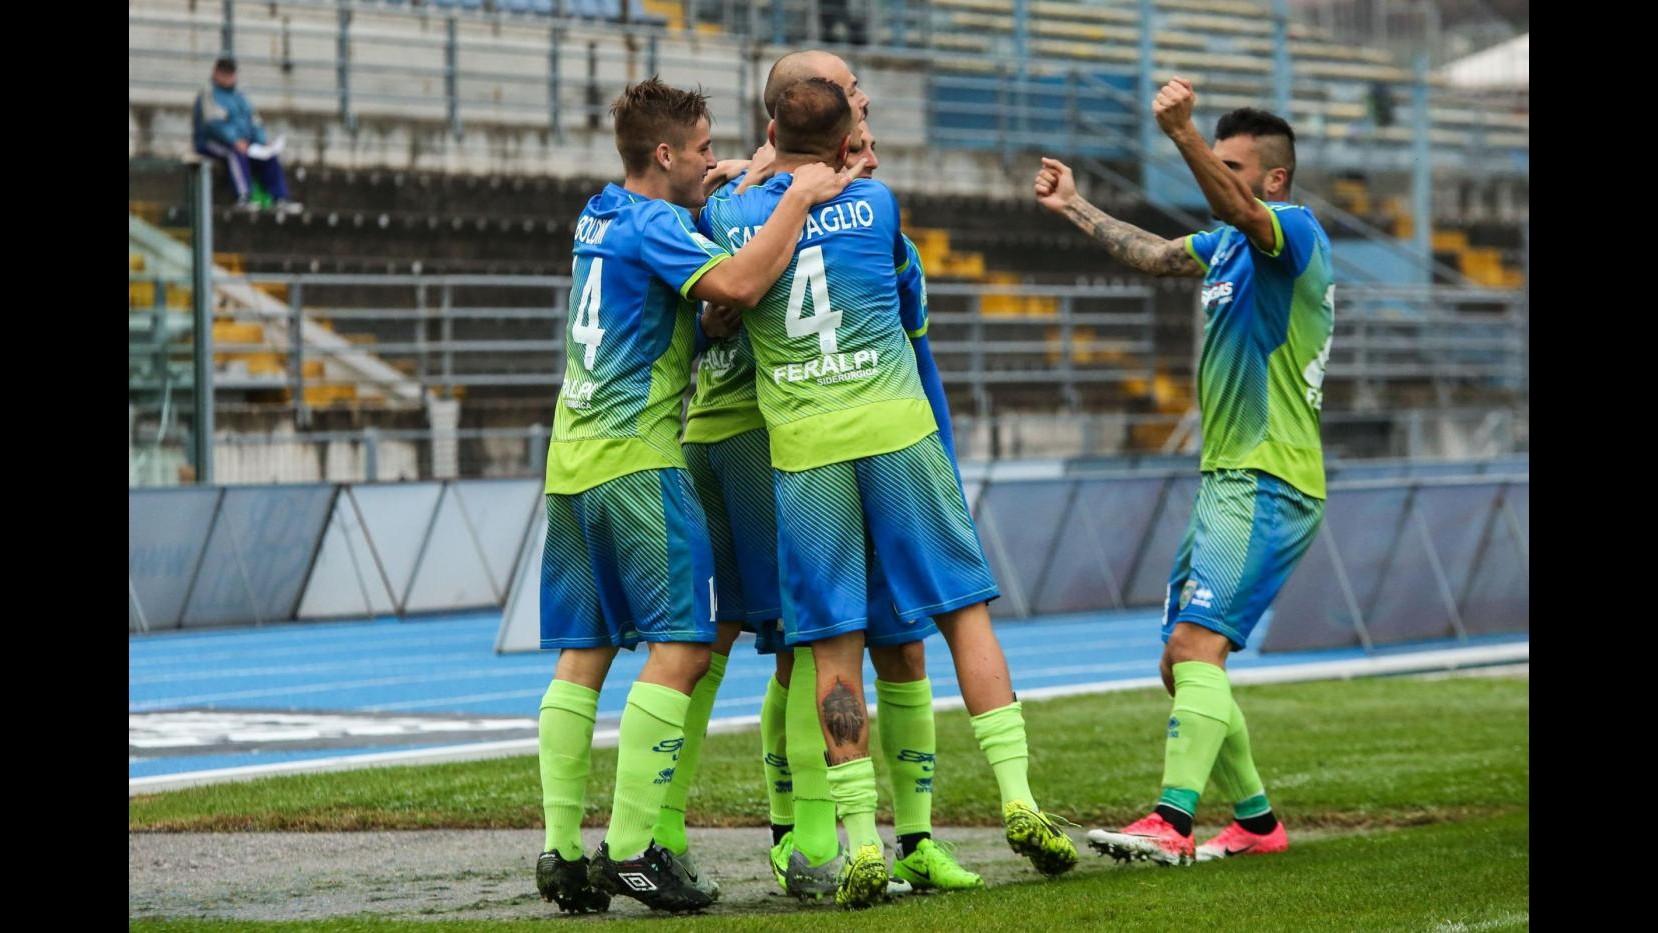 Serie C, FeralpiSalò-Gubbio 2-1